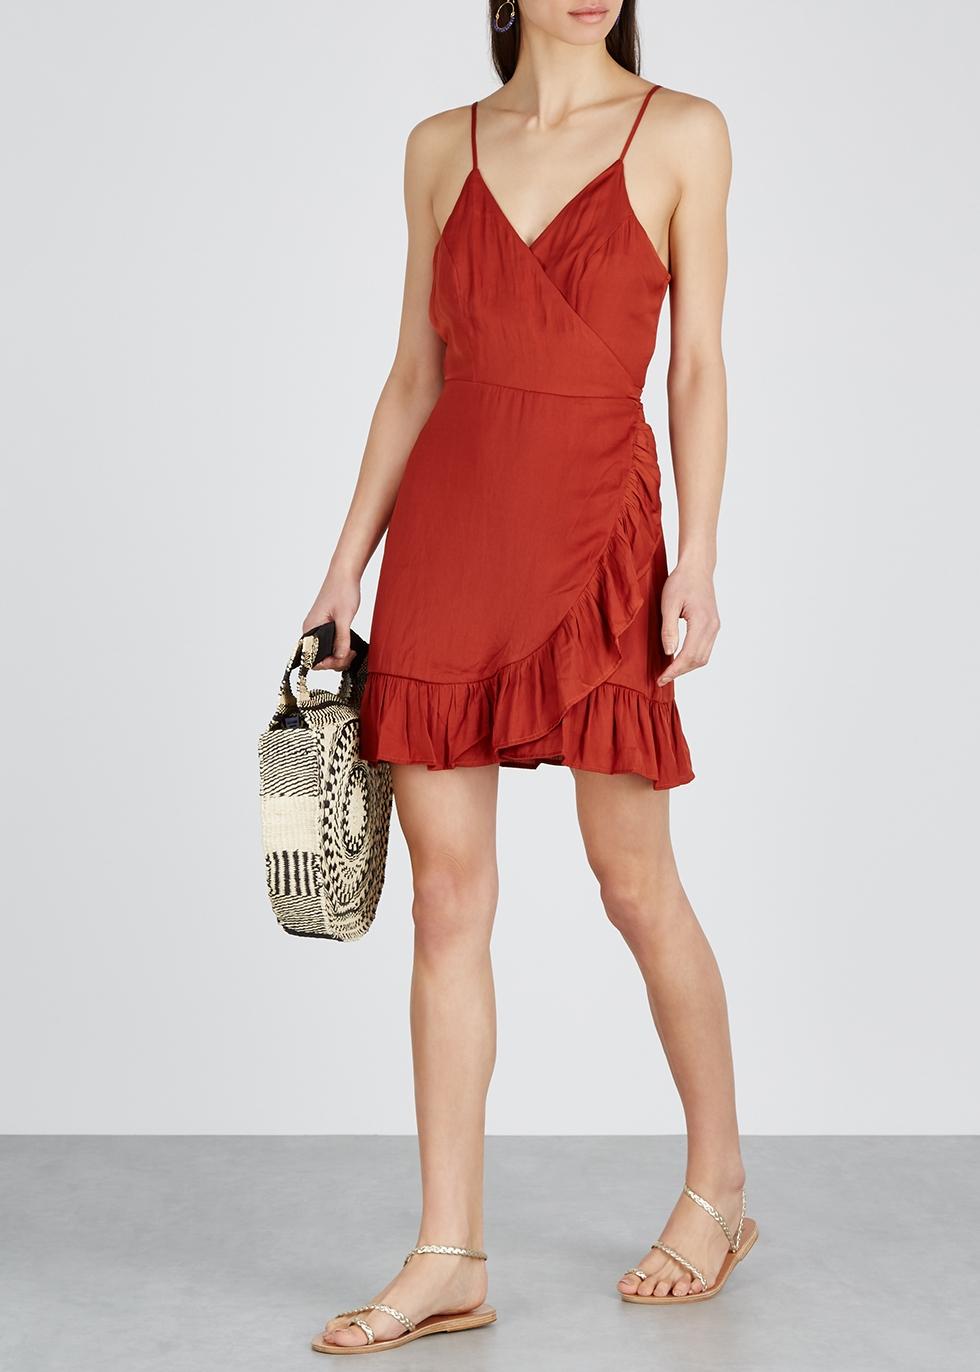 Designer Dresses   Designer Gowns - Harvey Nichols bcf92db3b